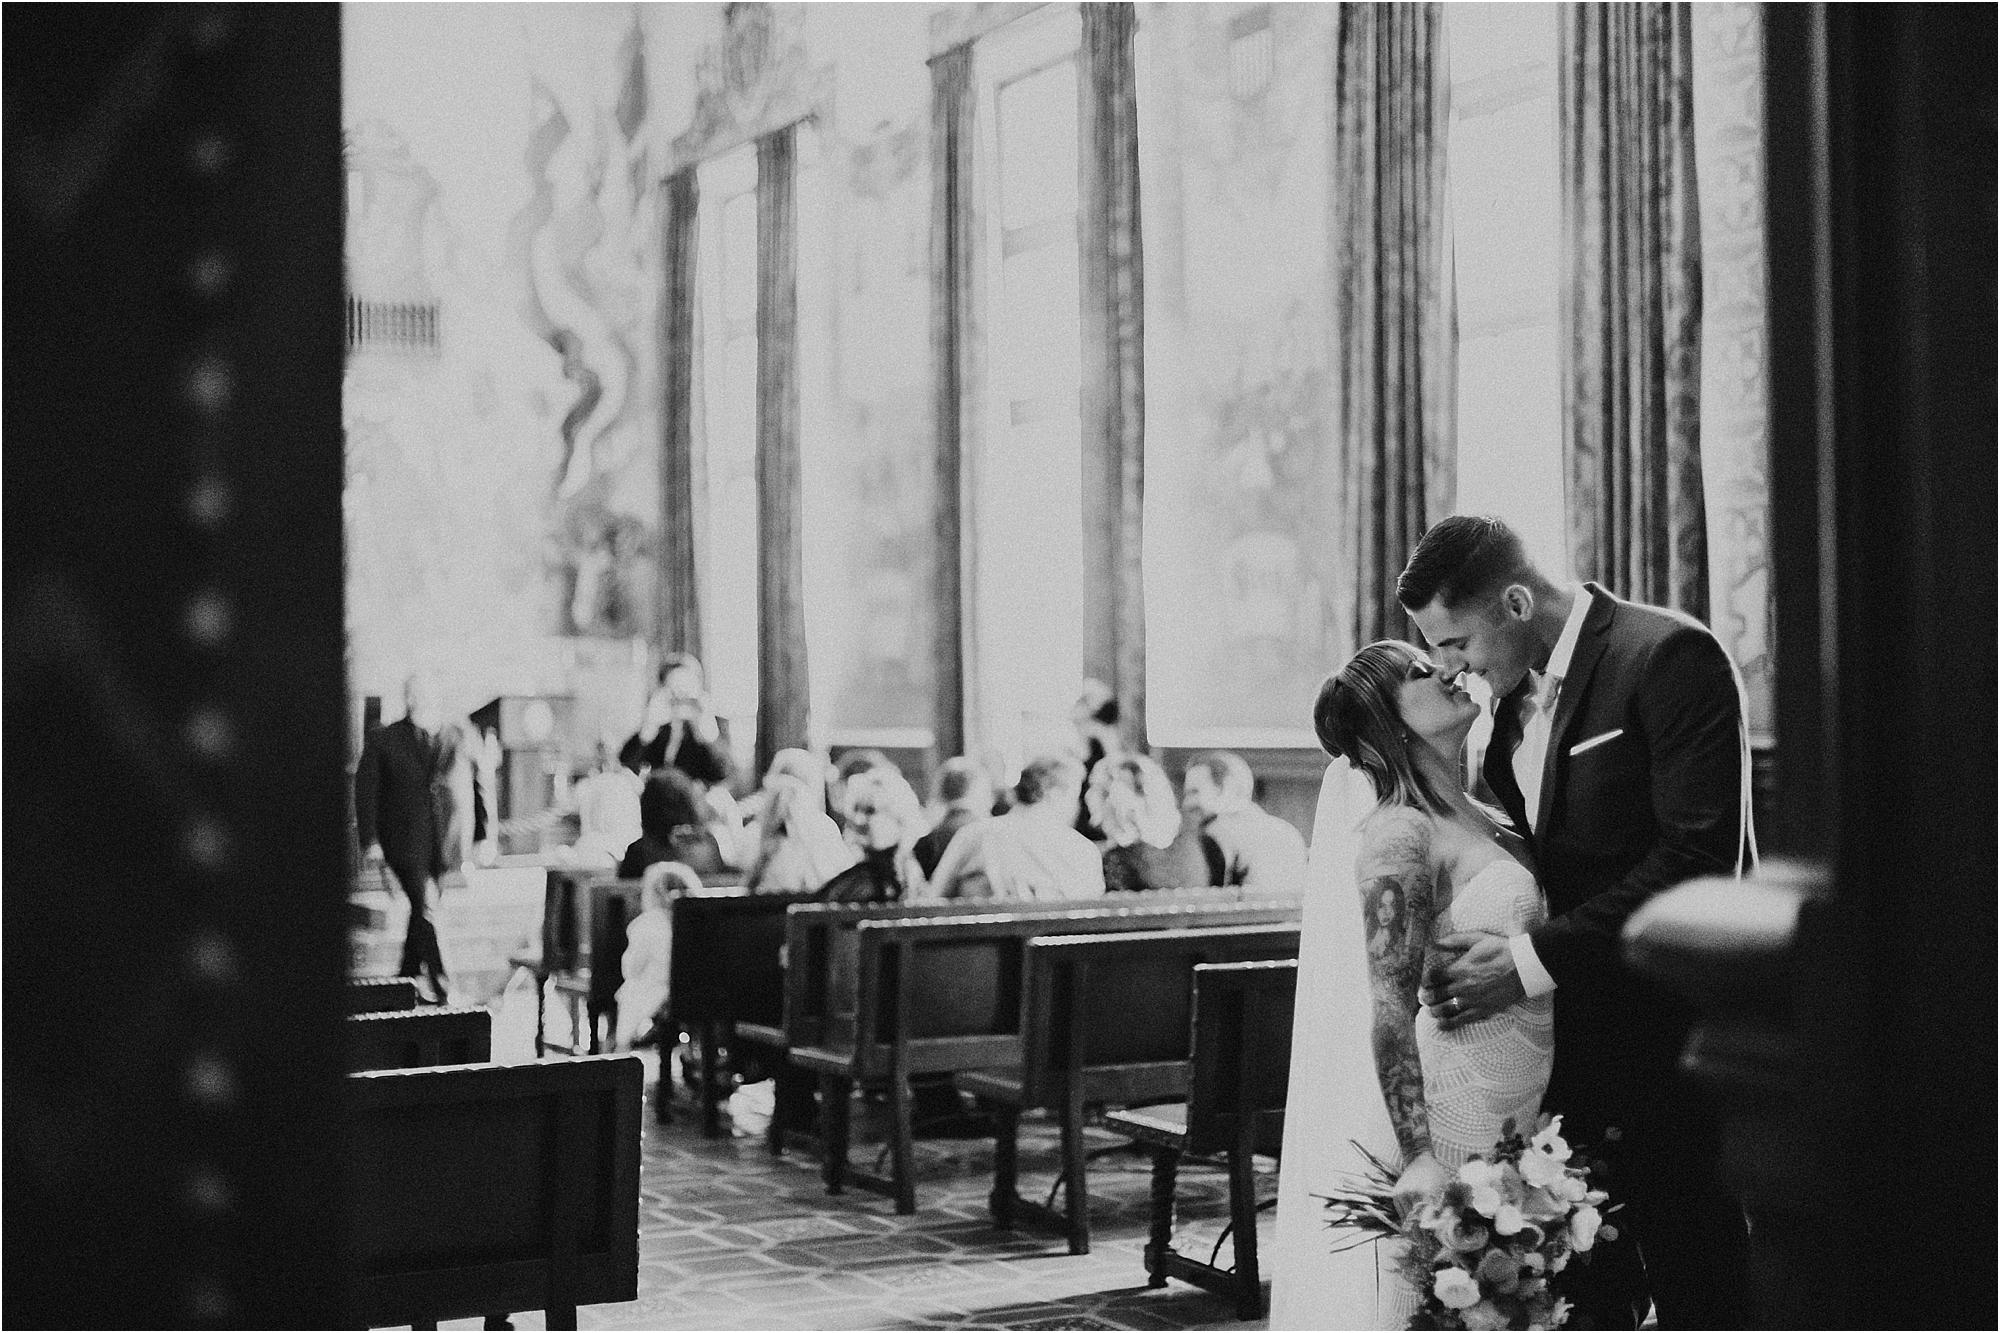 angie-diaz-photography-santa-barbara-courthouse-california-hawaii-wedding-photographer_0053.jpg